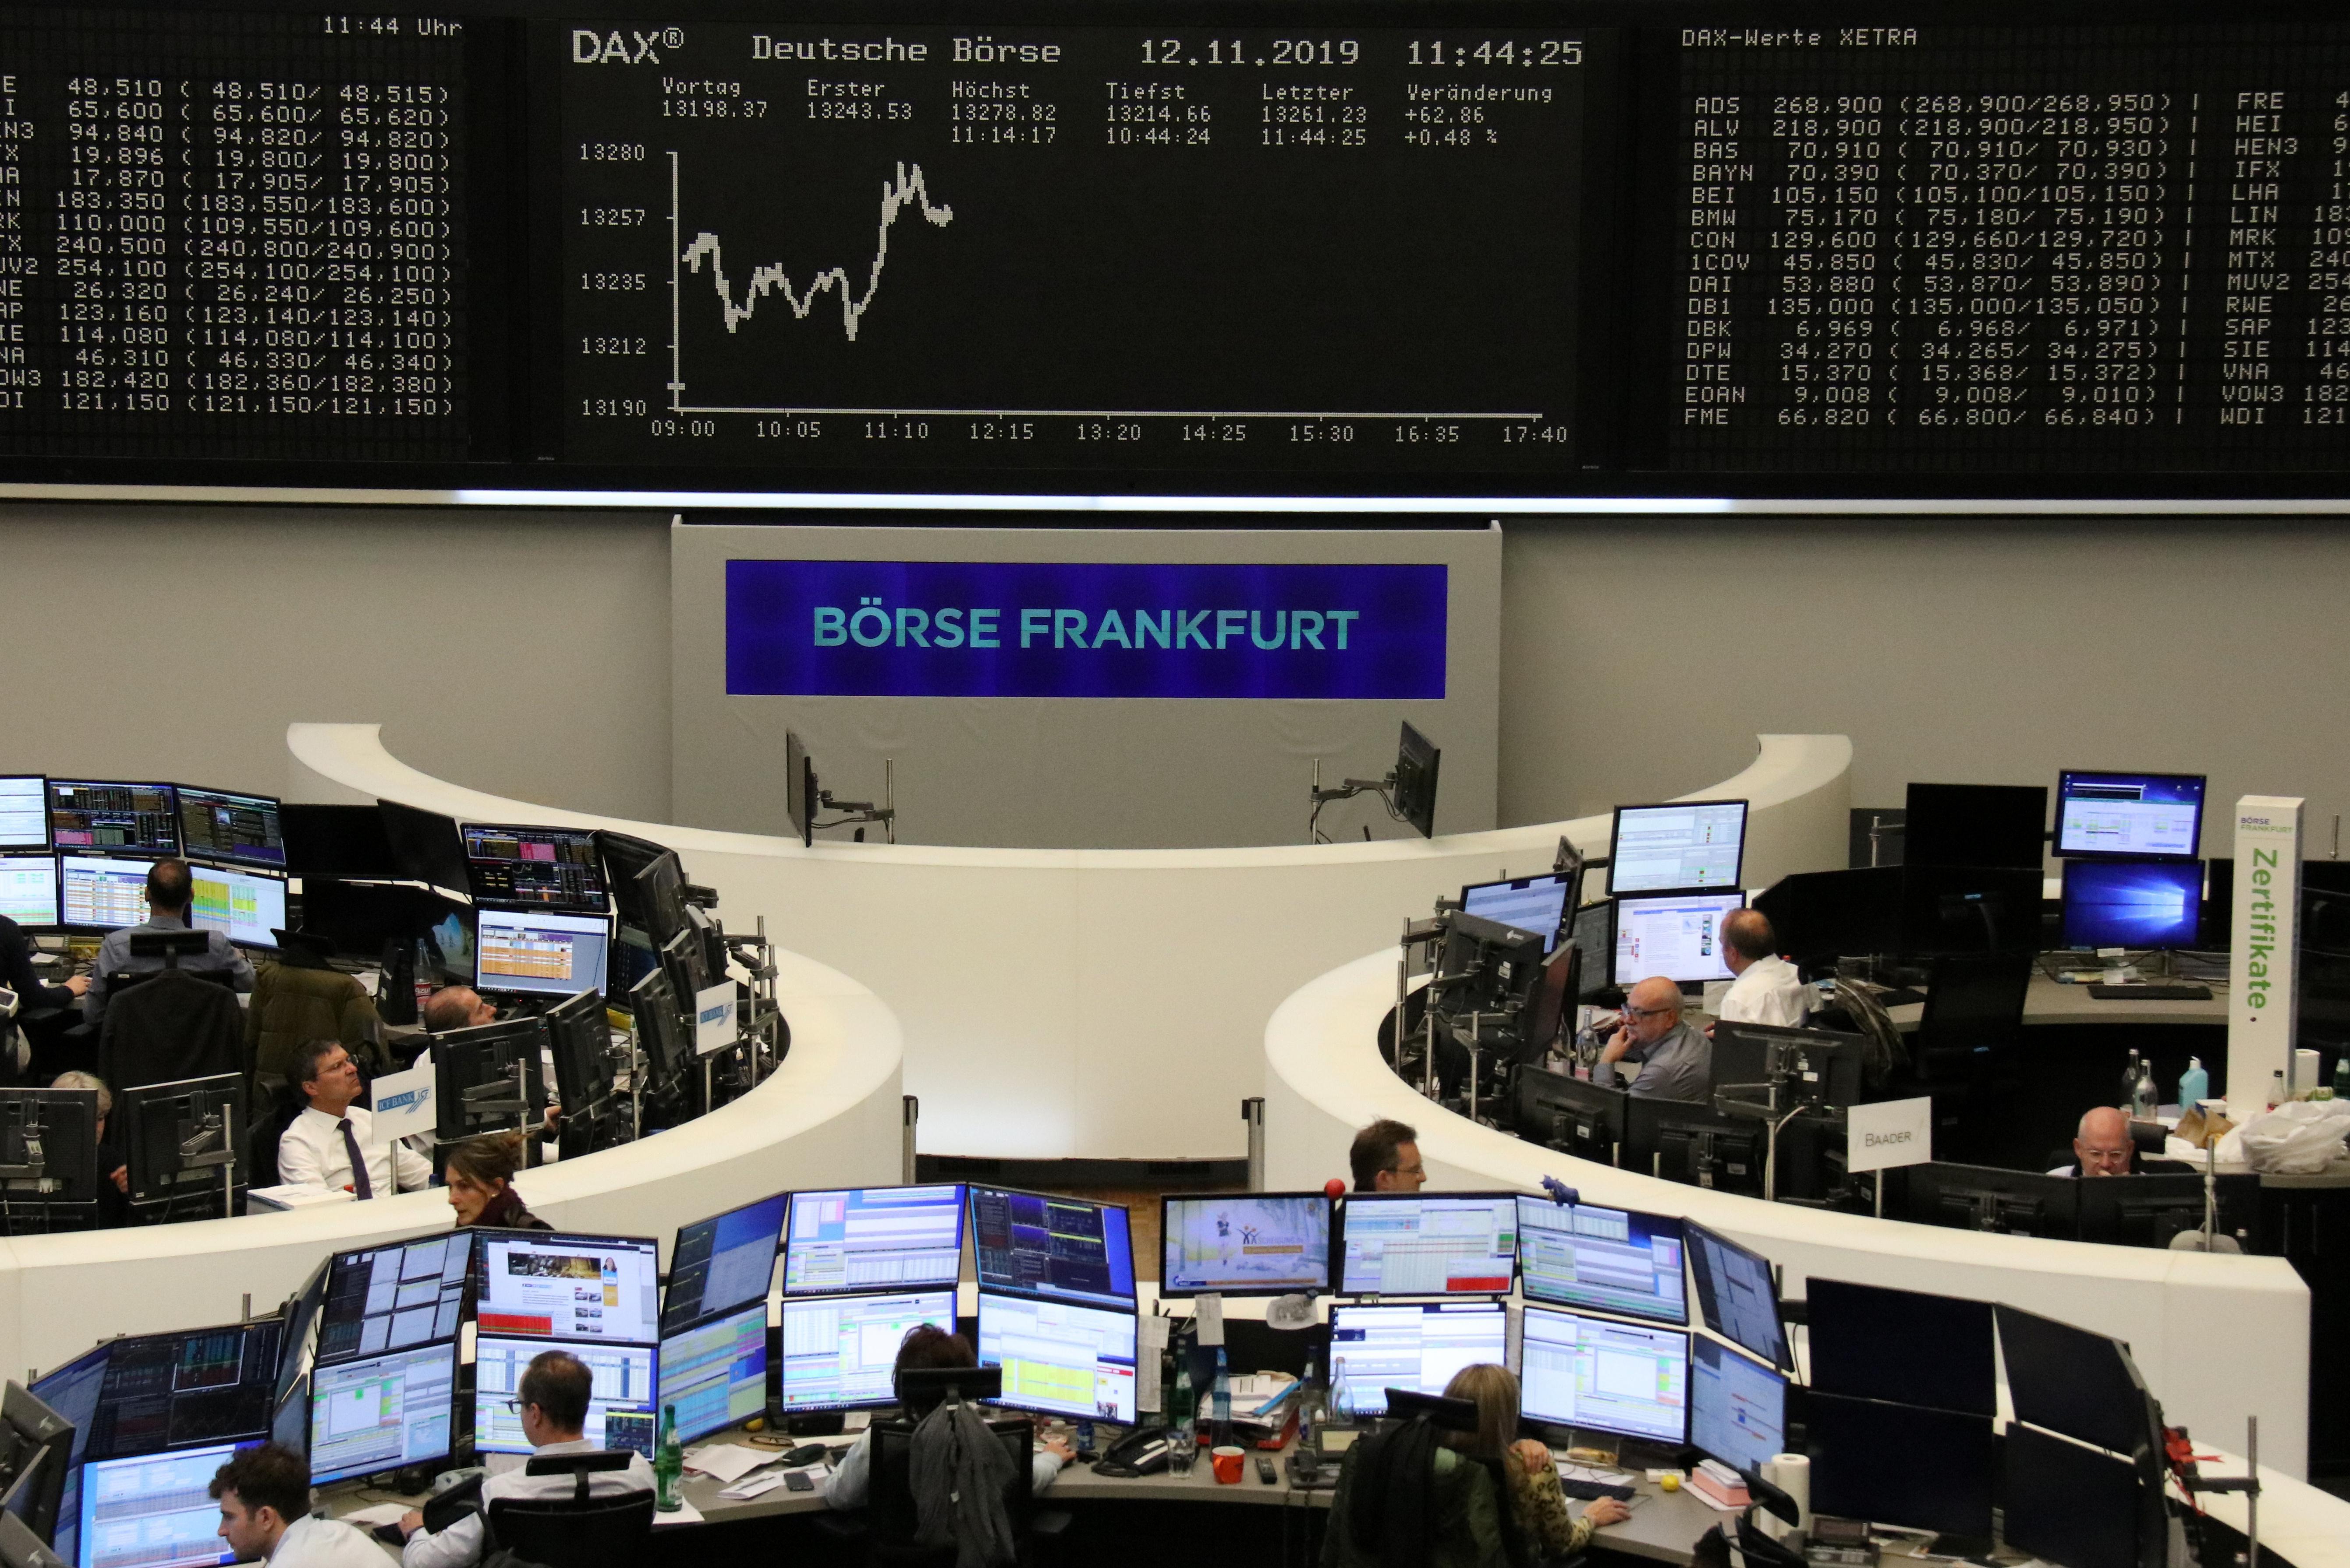 European shares take a breather, ease off four-year peak